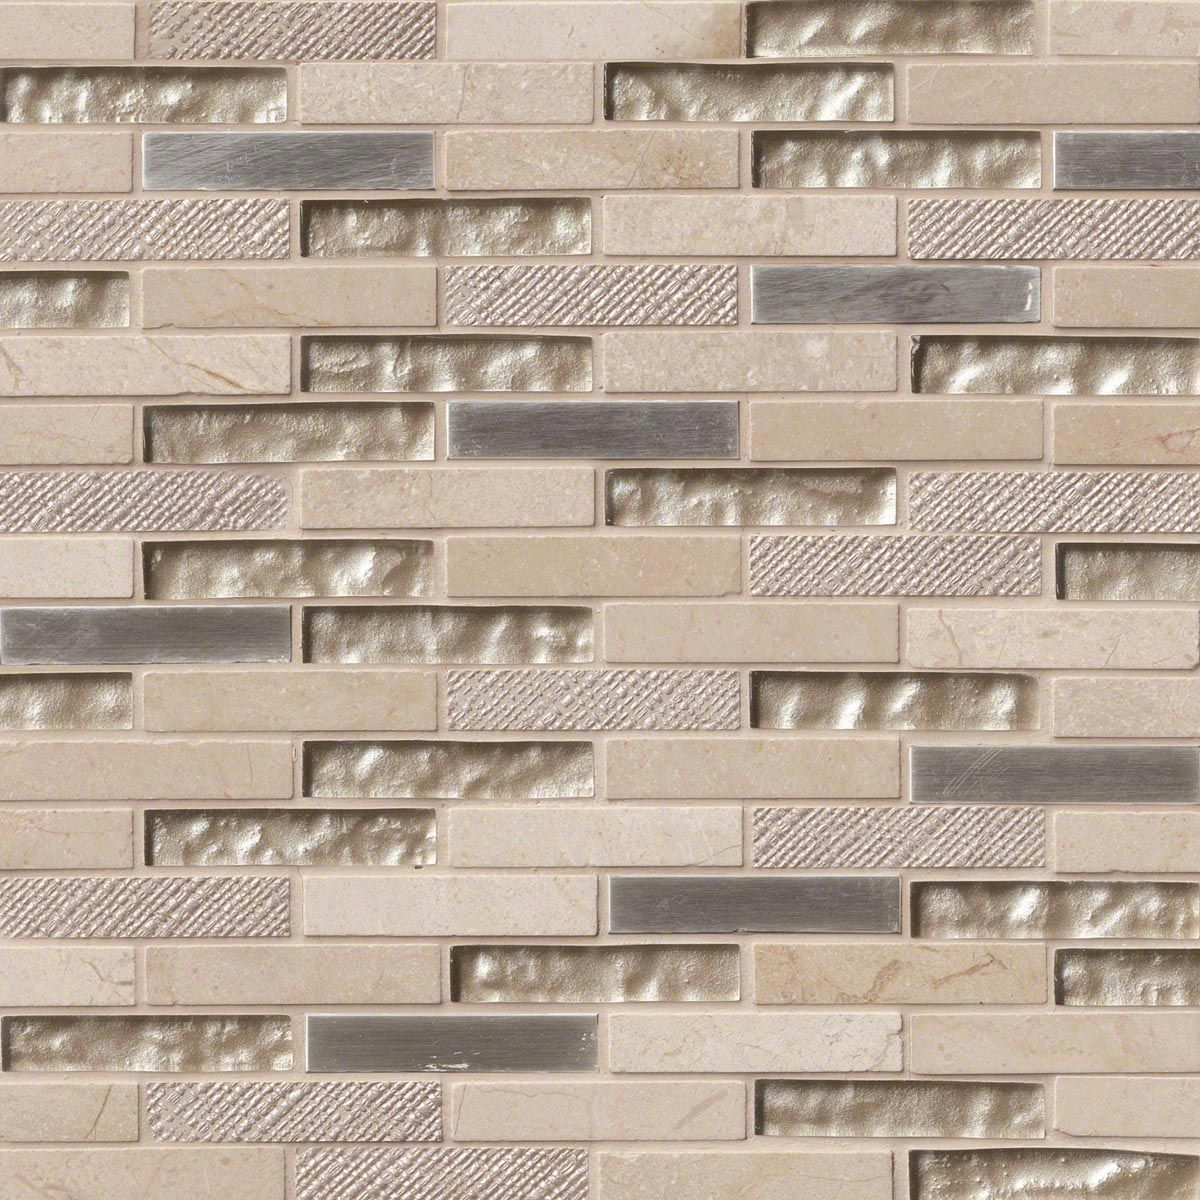 Vienna blend brick 0625x3x8 mm glass and stone mosaic backsplash vienna blend brick 0625x3x8 mm glass and stone mosaic backsplash tile dailygadgetfo Choice Image